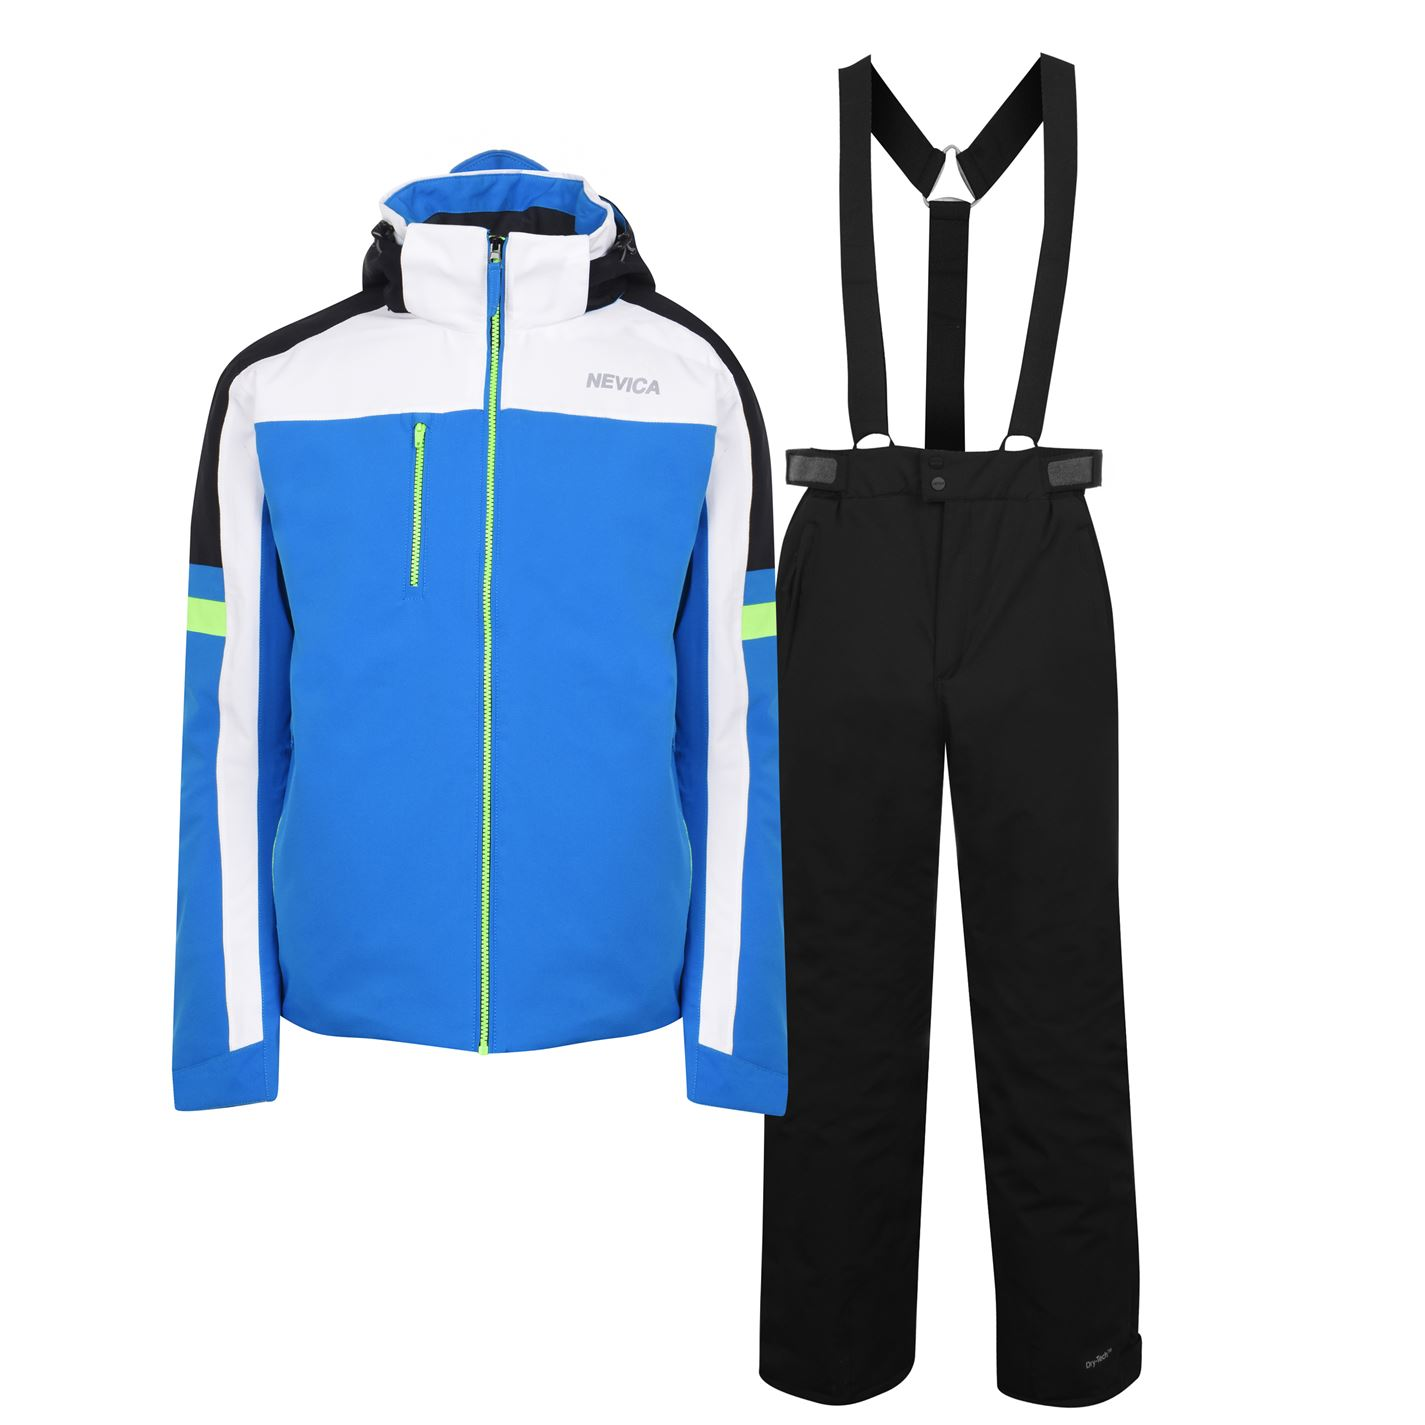 Mergi la Echipament schi Nevica Meribel pentru Barbati albastru